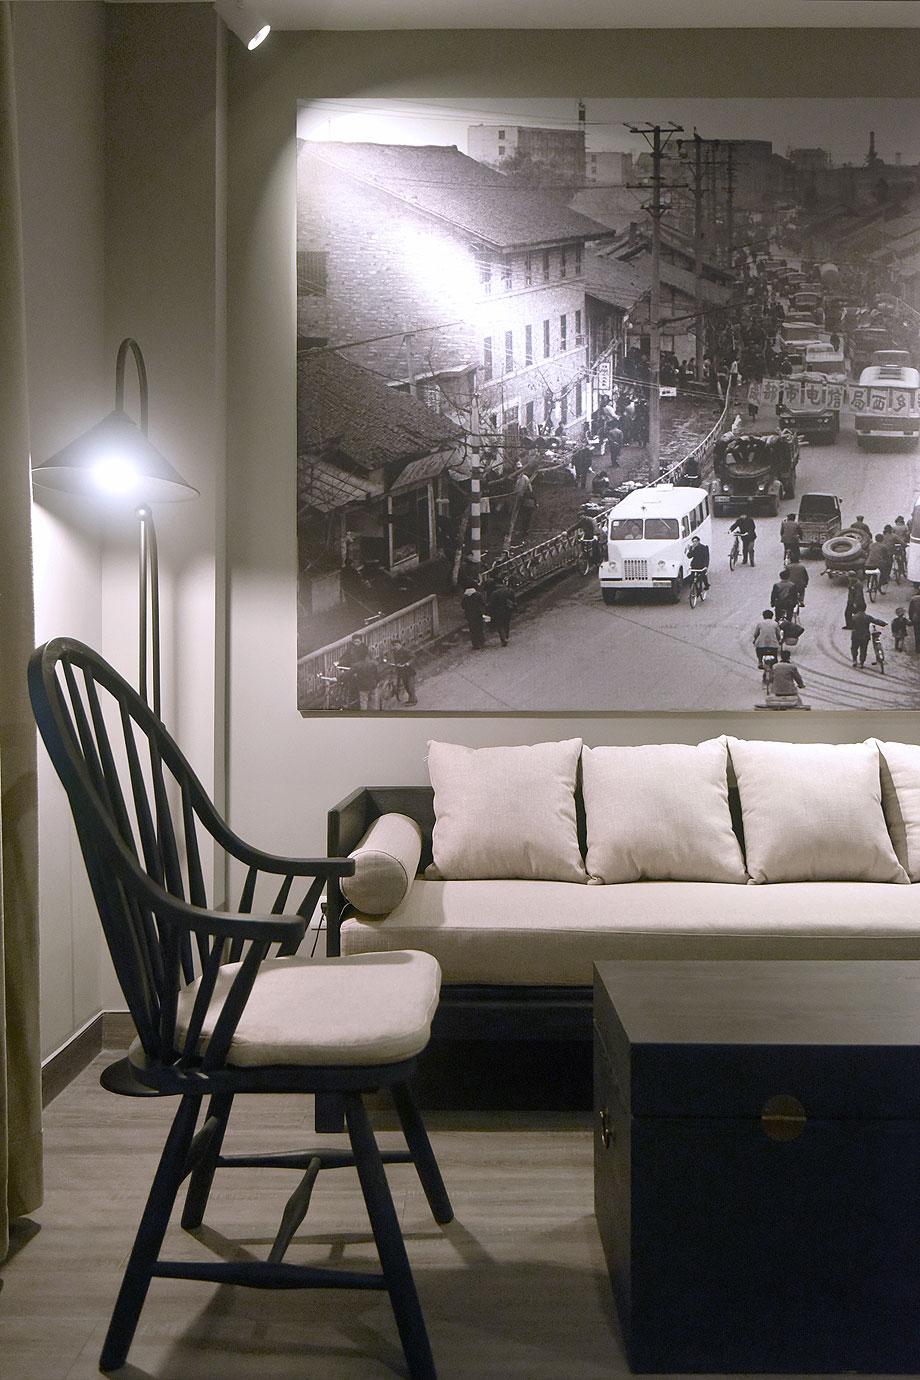 hotel-city-inn-chengdu-kuanzhai-alley-chu-chih-kang (7)